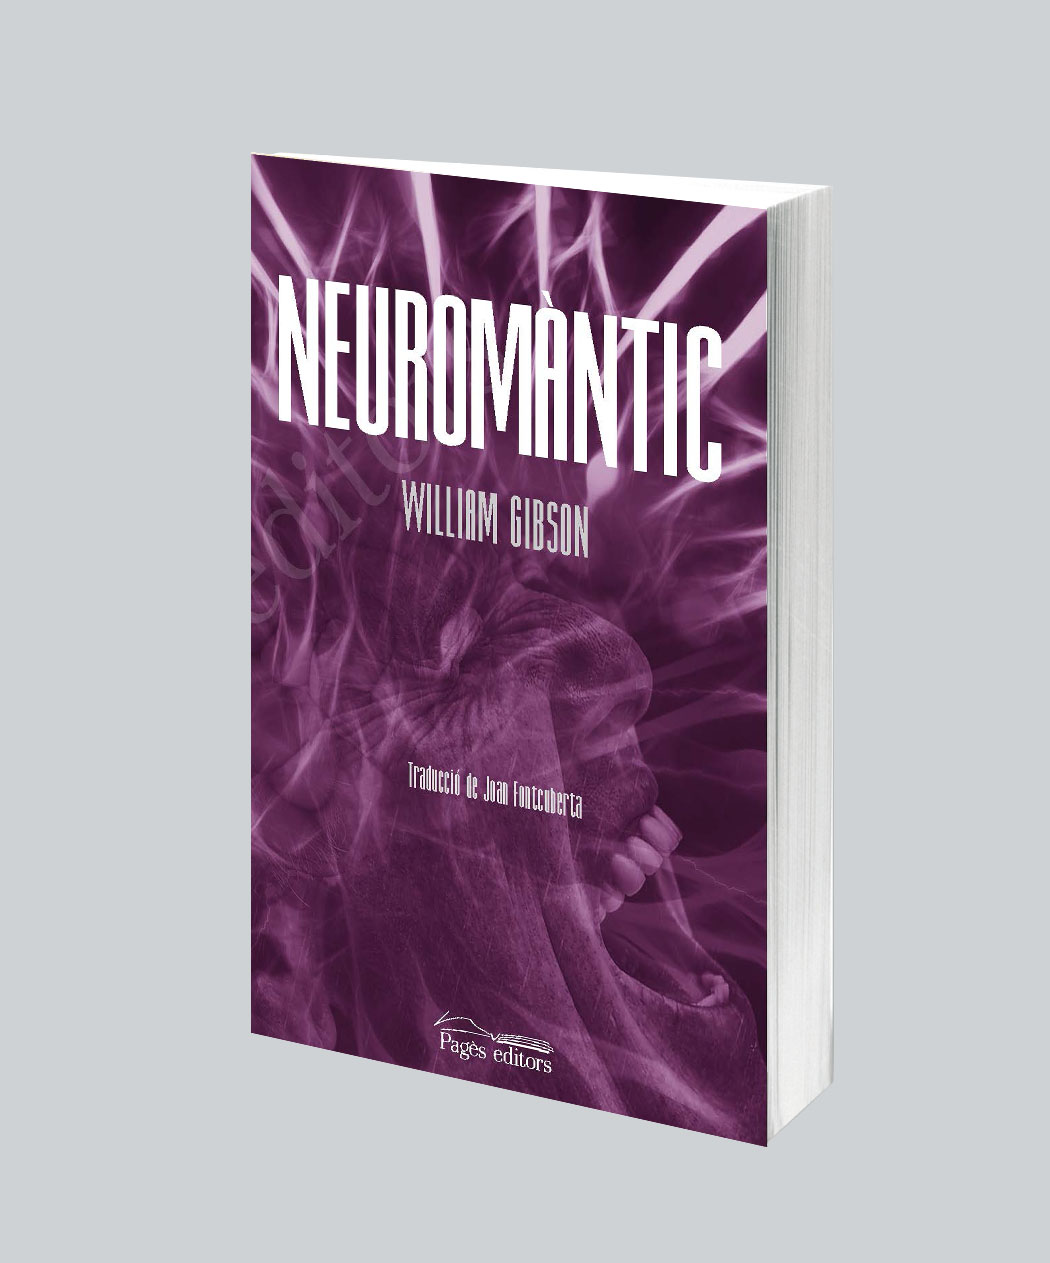 Pagès Editors publica 'Neuromàntic', de William Gibson